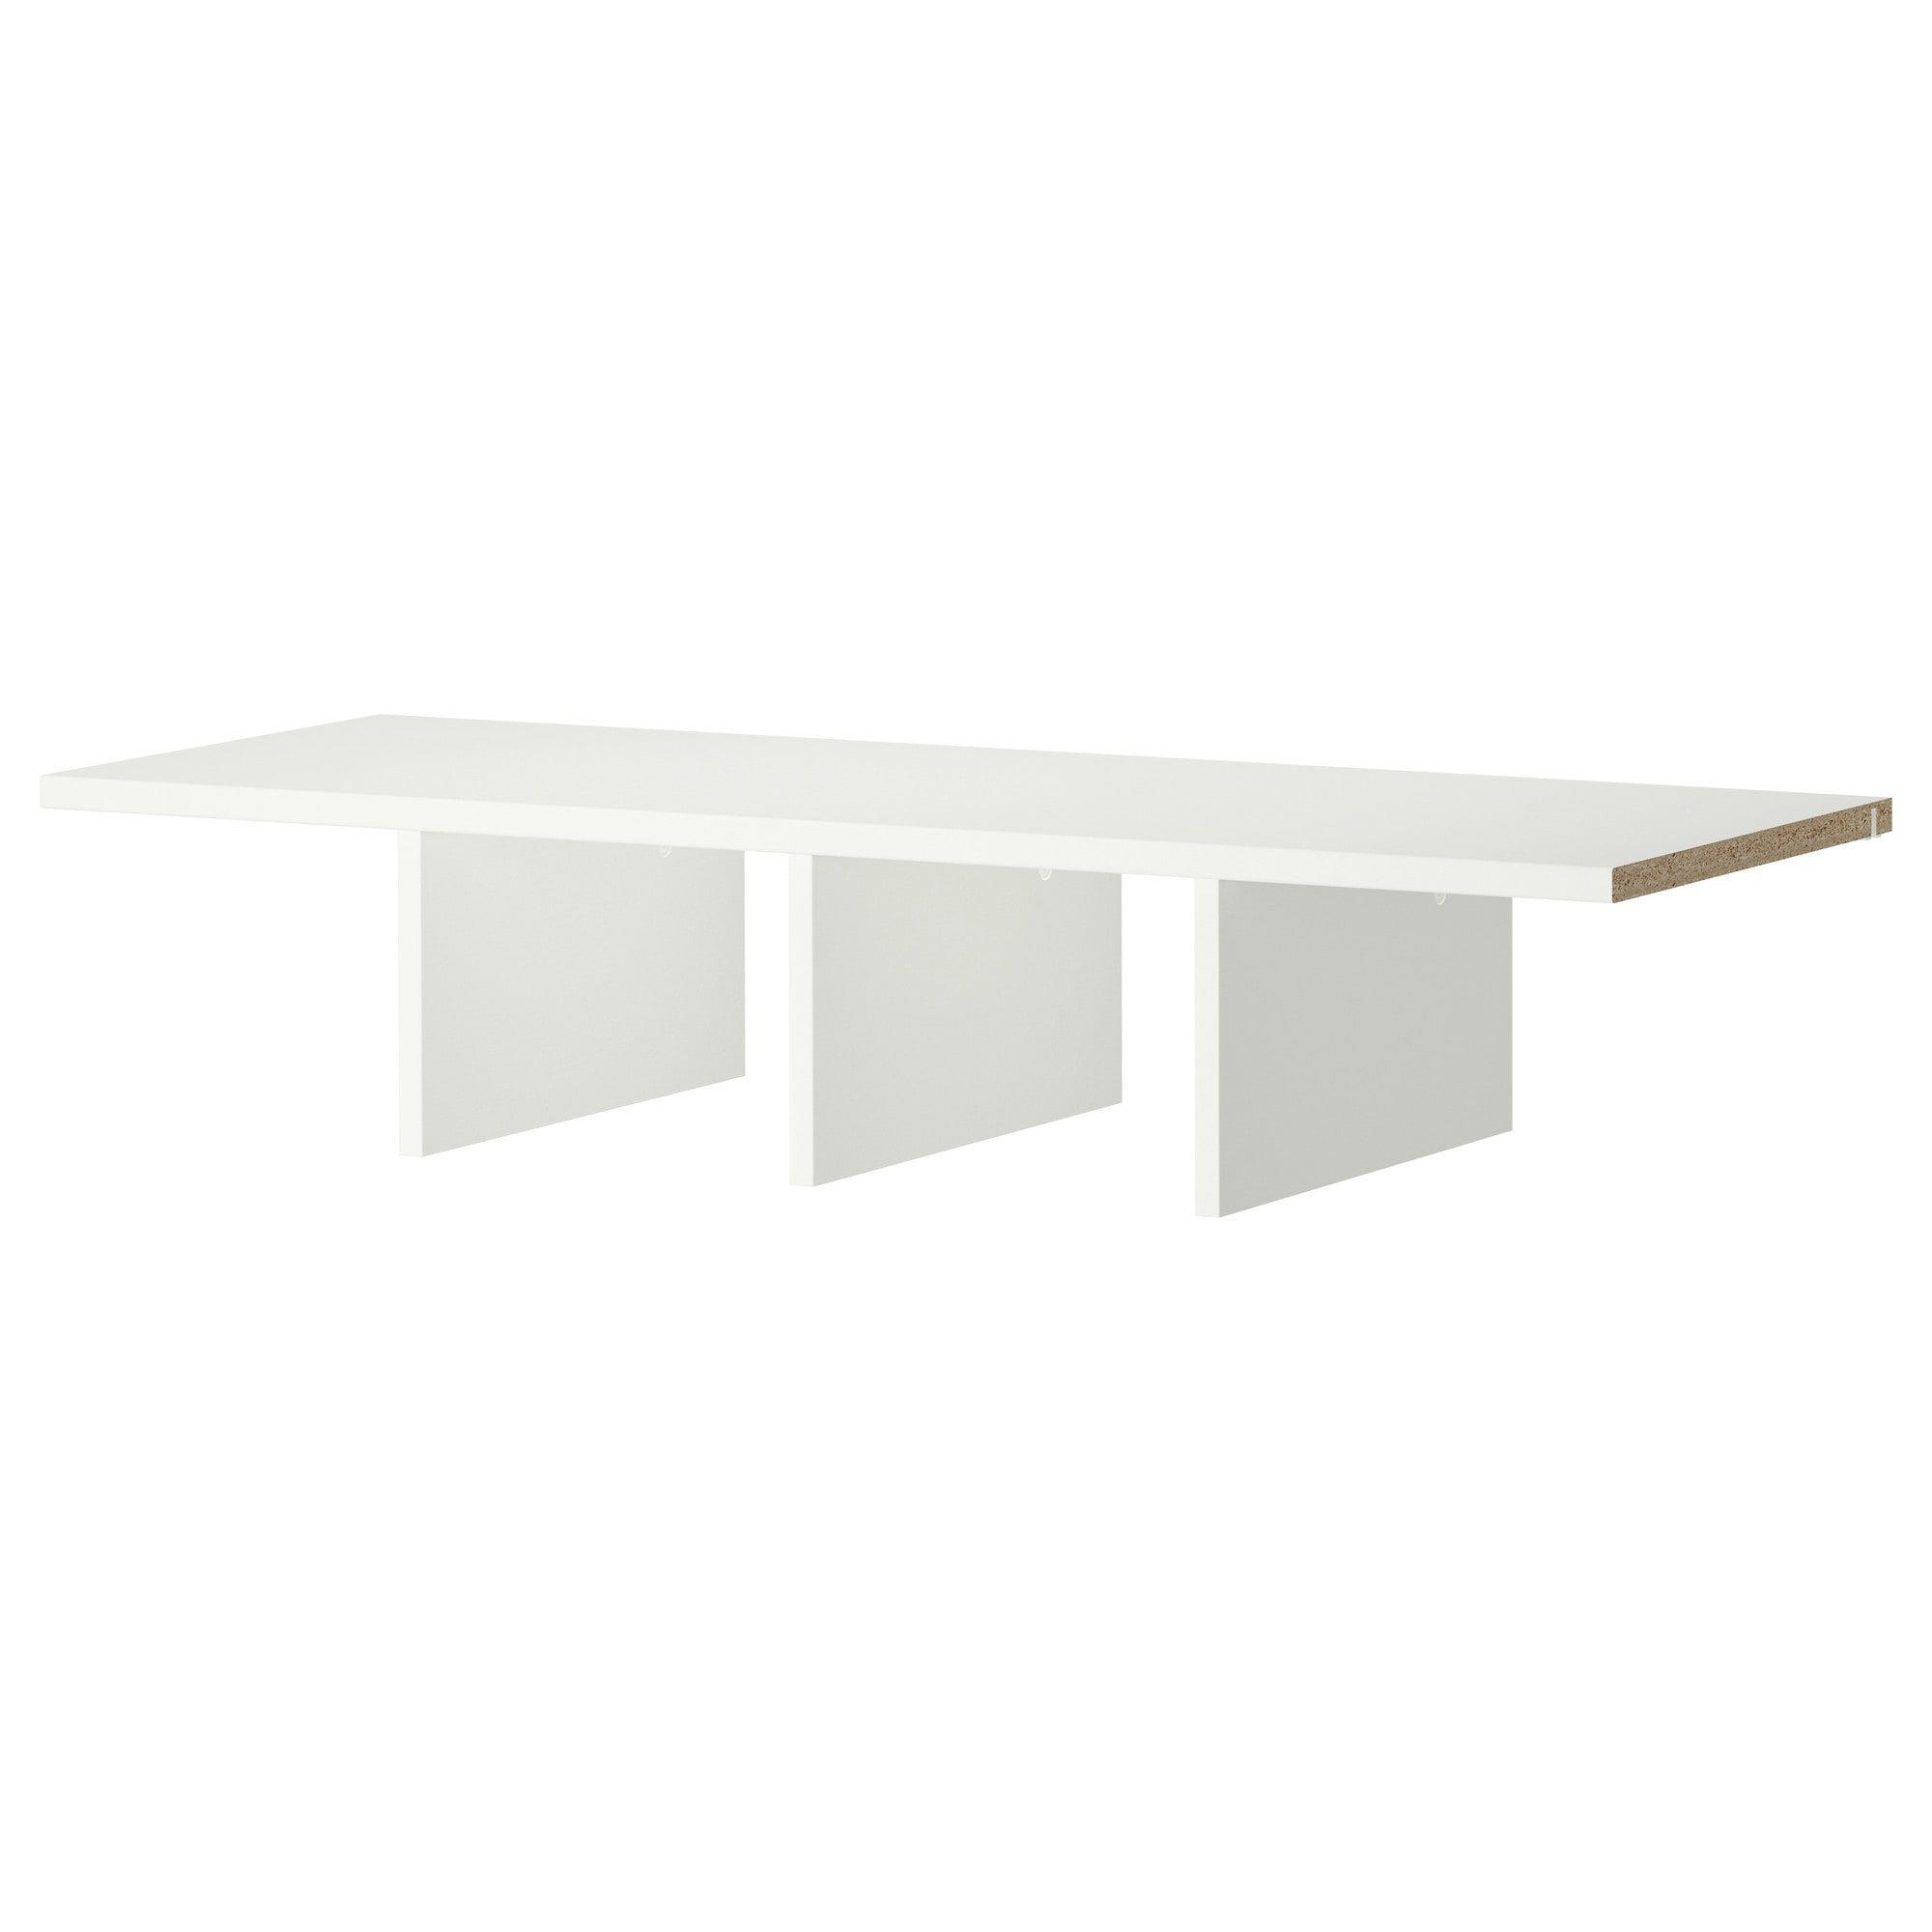 Komplement Regaleinsatz Weiss Regal Ikea Einkaufen Ikea